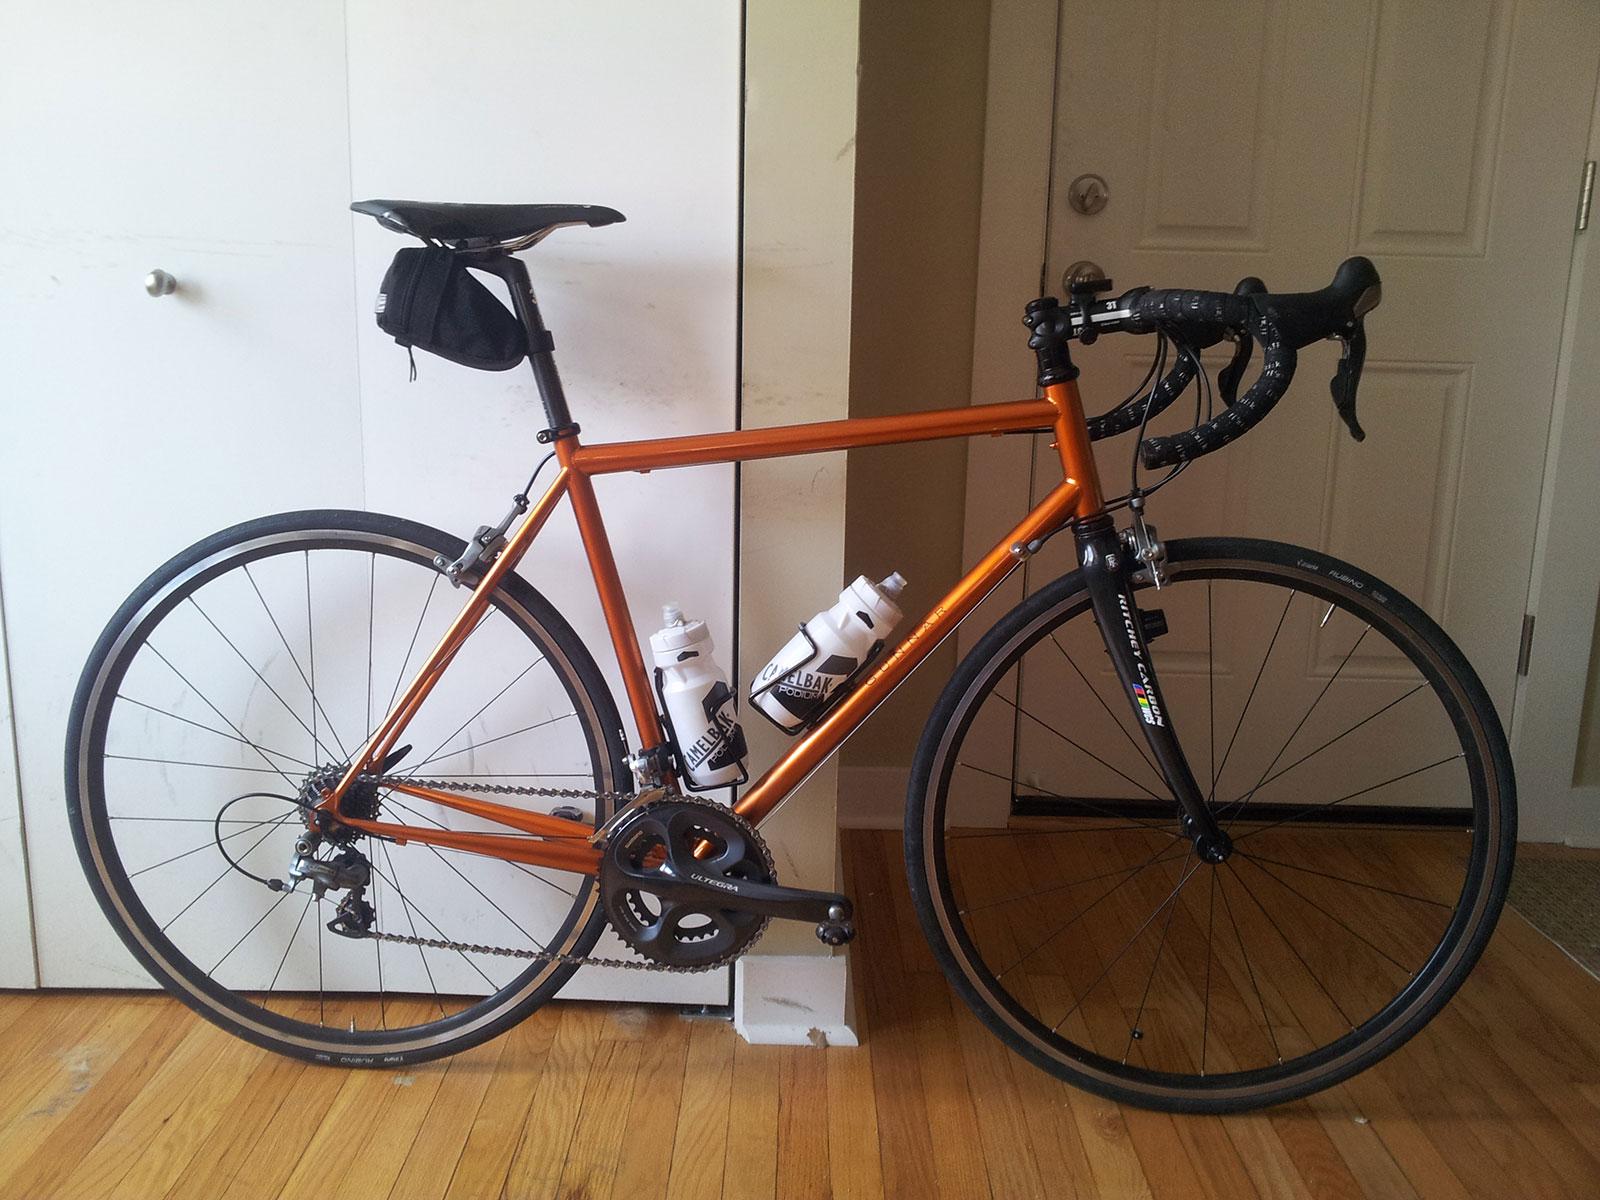 Bike Serial Number Search Bing Images